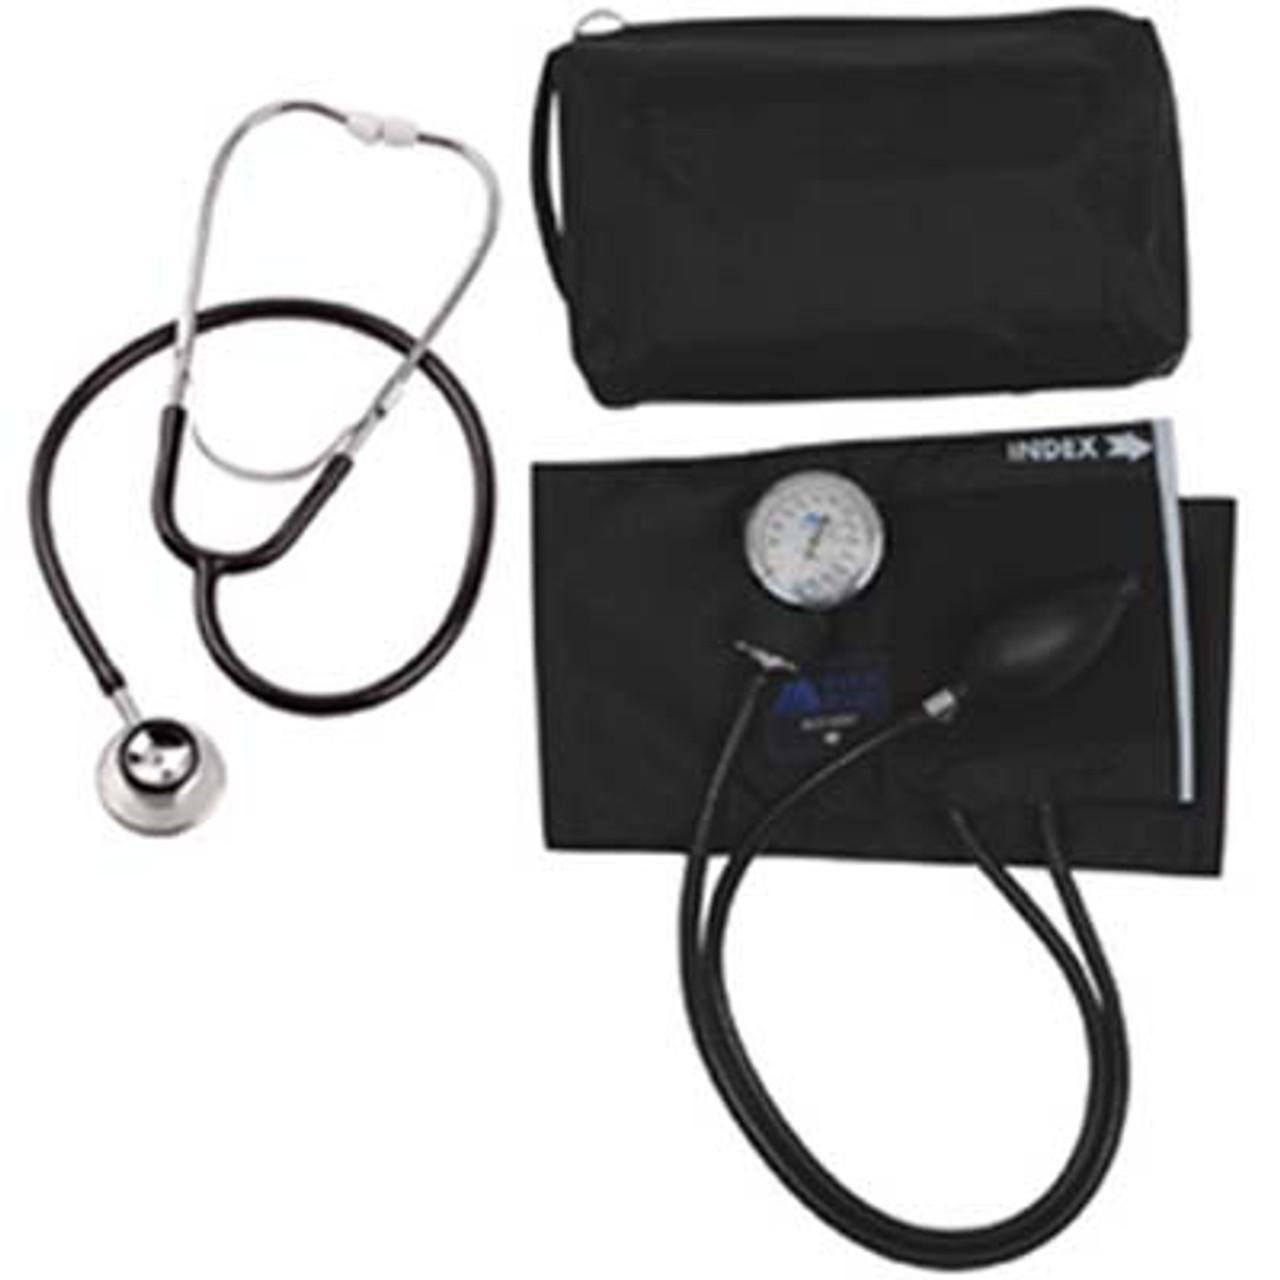 Stethoscope & BP Combo Kits